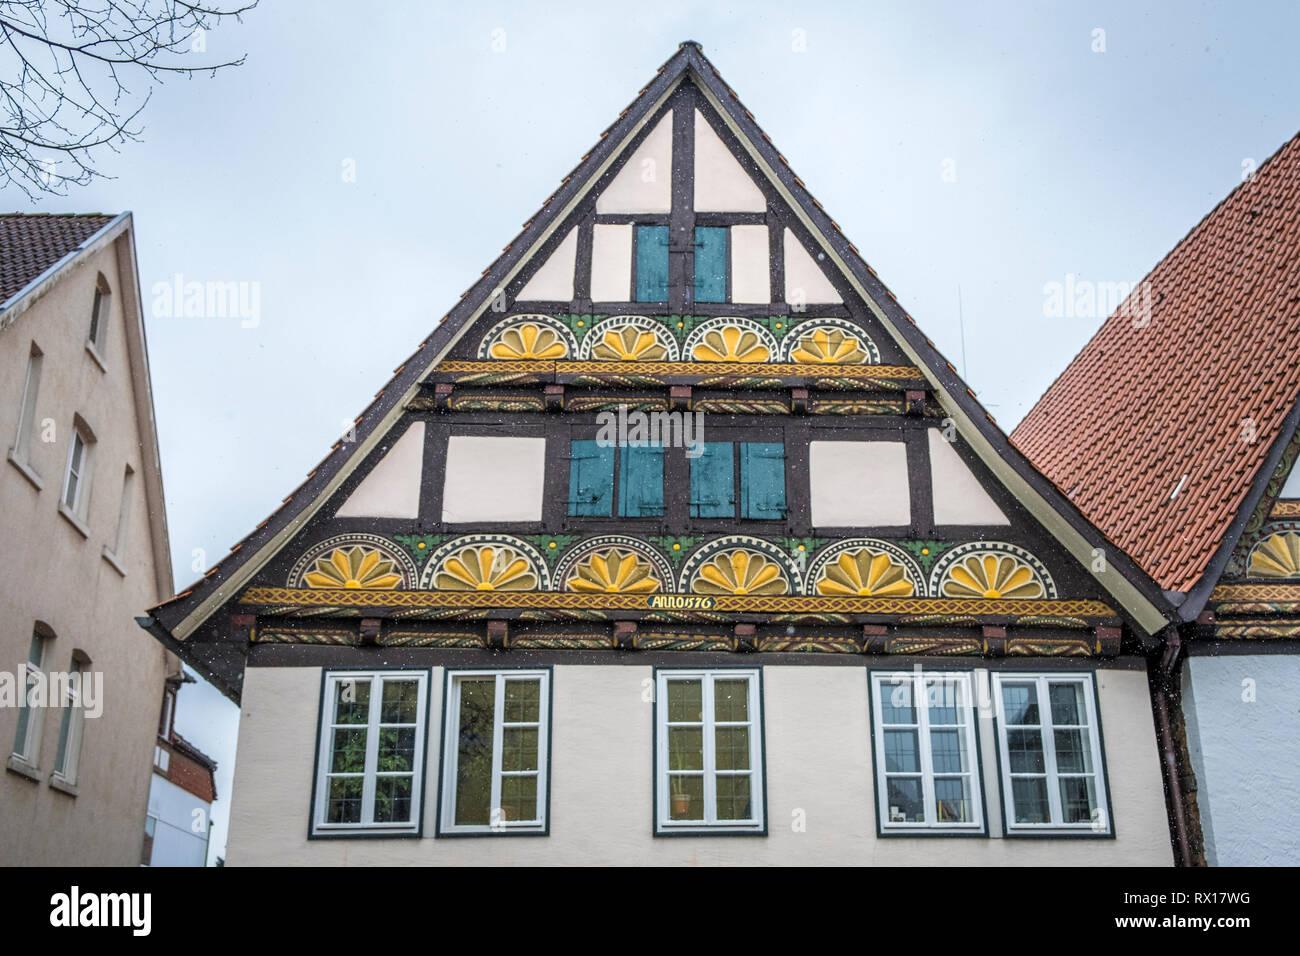 half-timber house in Lemgo, Nord-Rhein-Westfalen, Germany - Stock Image